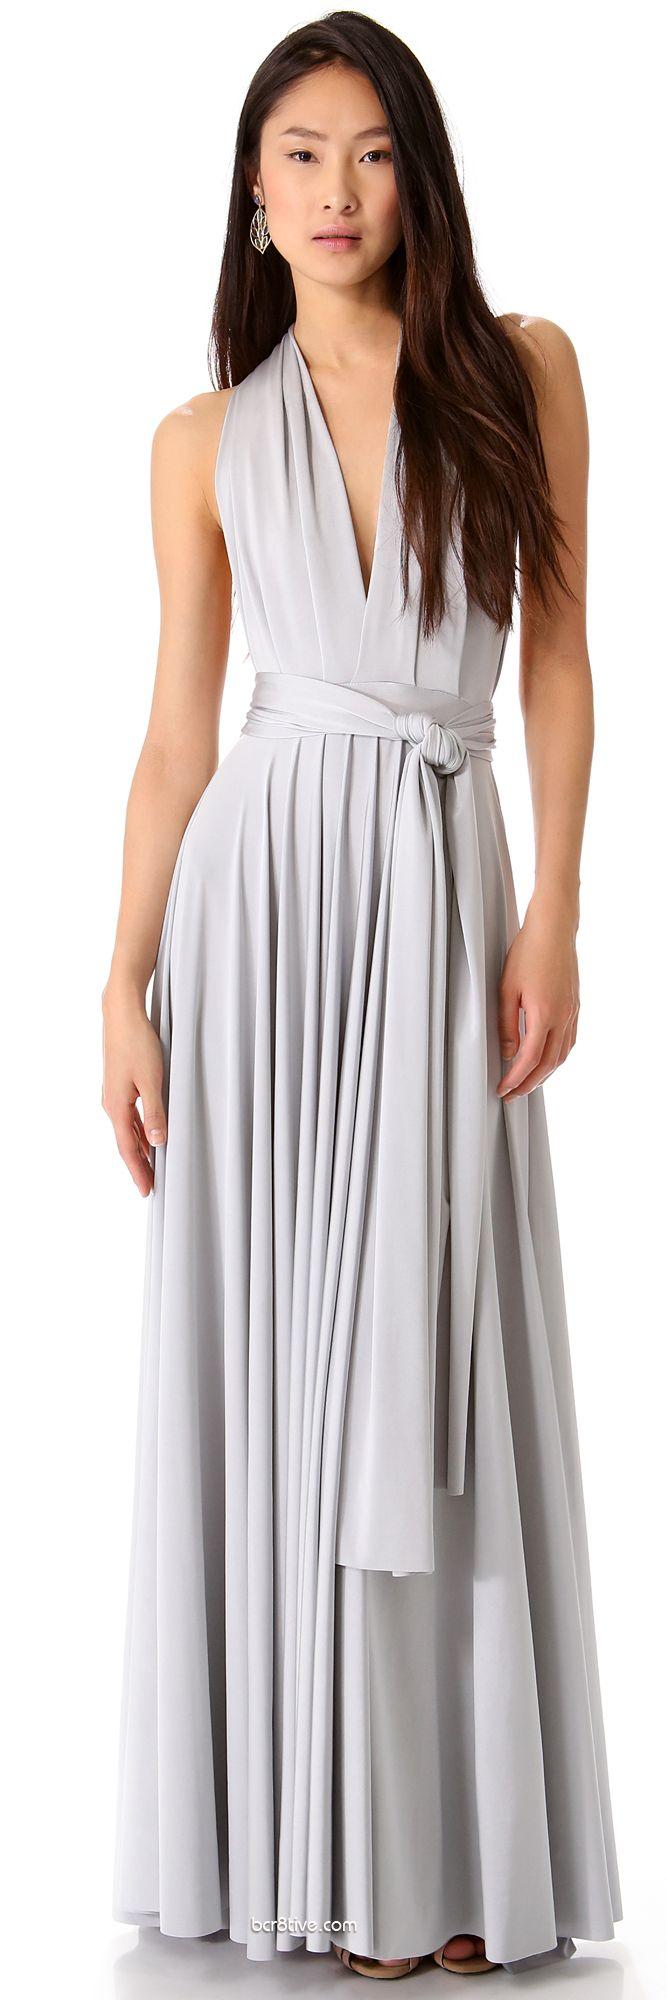 Twobirds Convertible Maxi Dress...